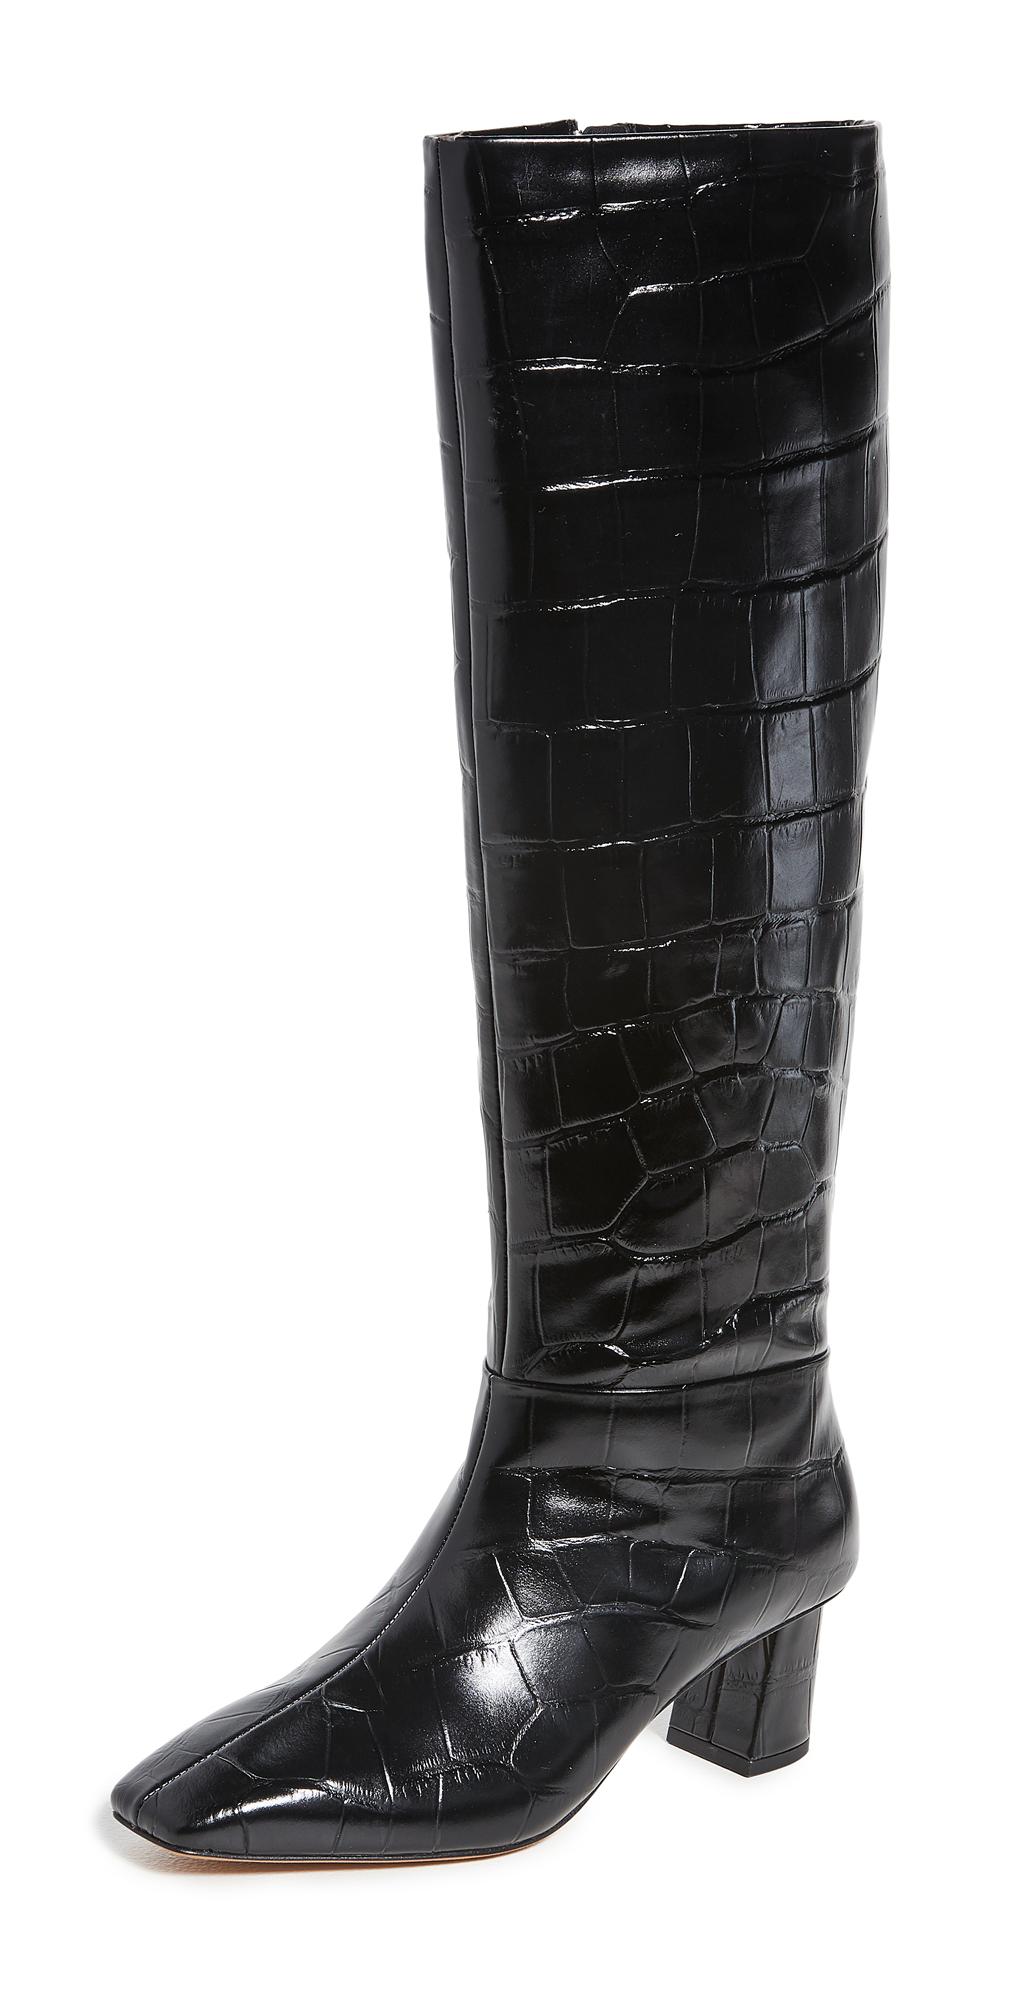 3.1 Phillip Lim Tess 60Mm Square Toe Boots